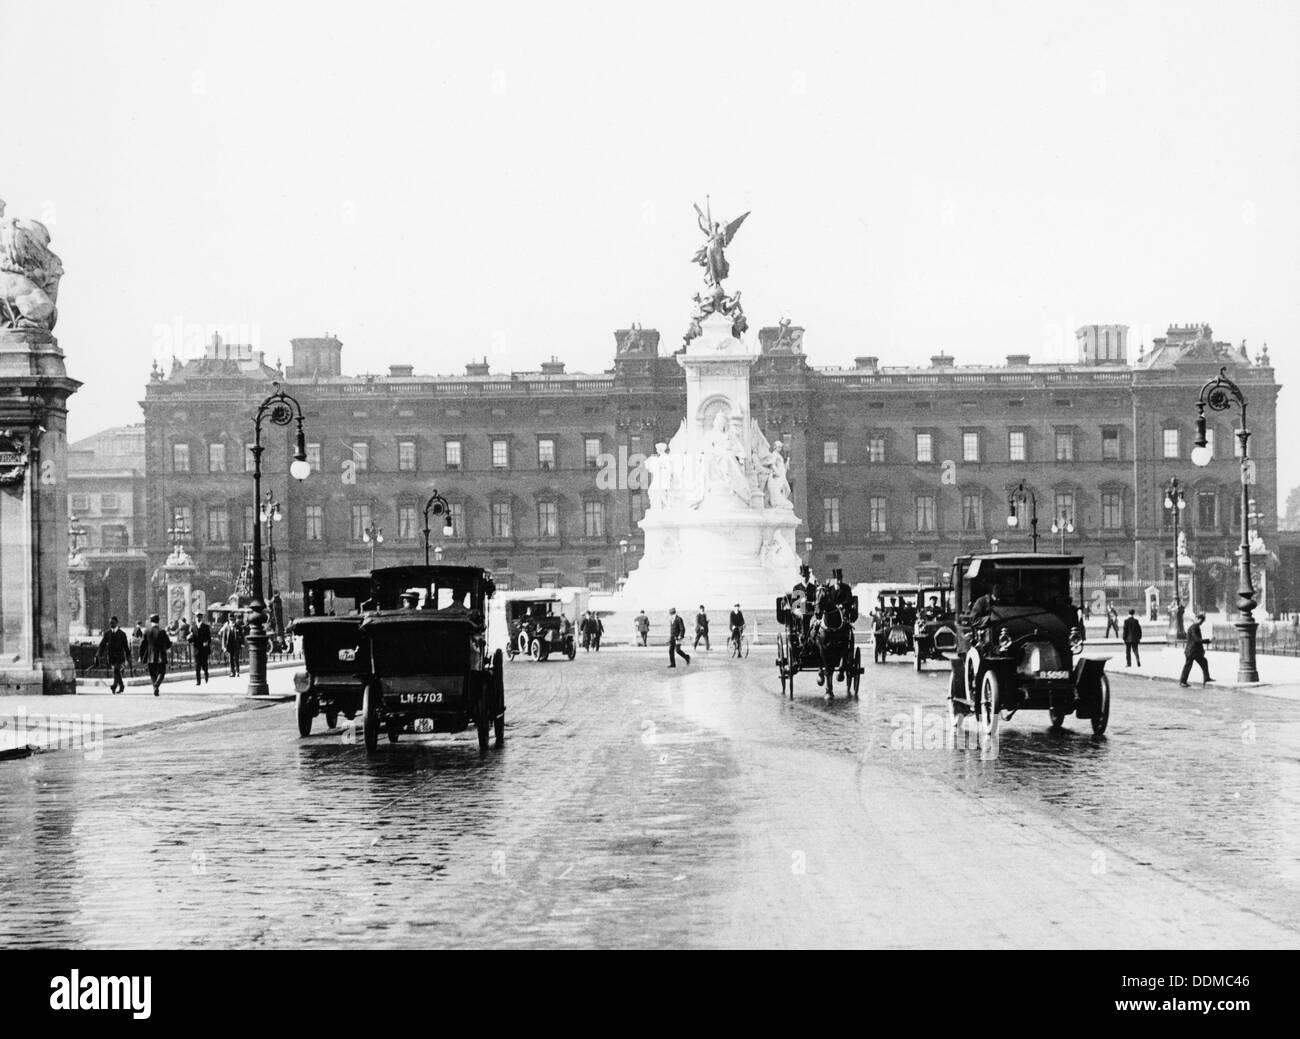 Buckingham Palace and the Mall, London, 1910. - Stock Image